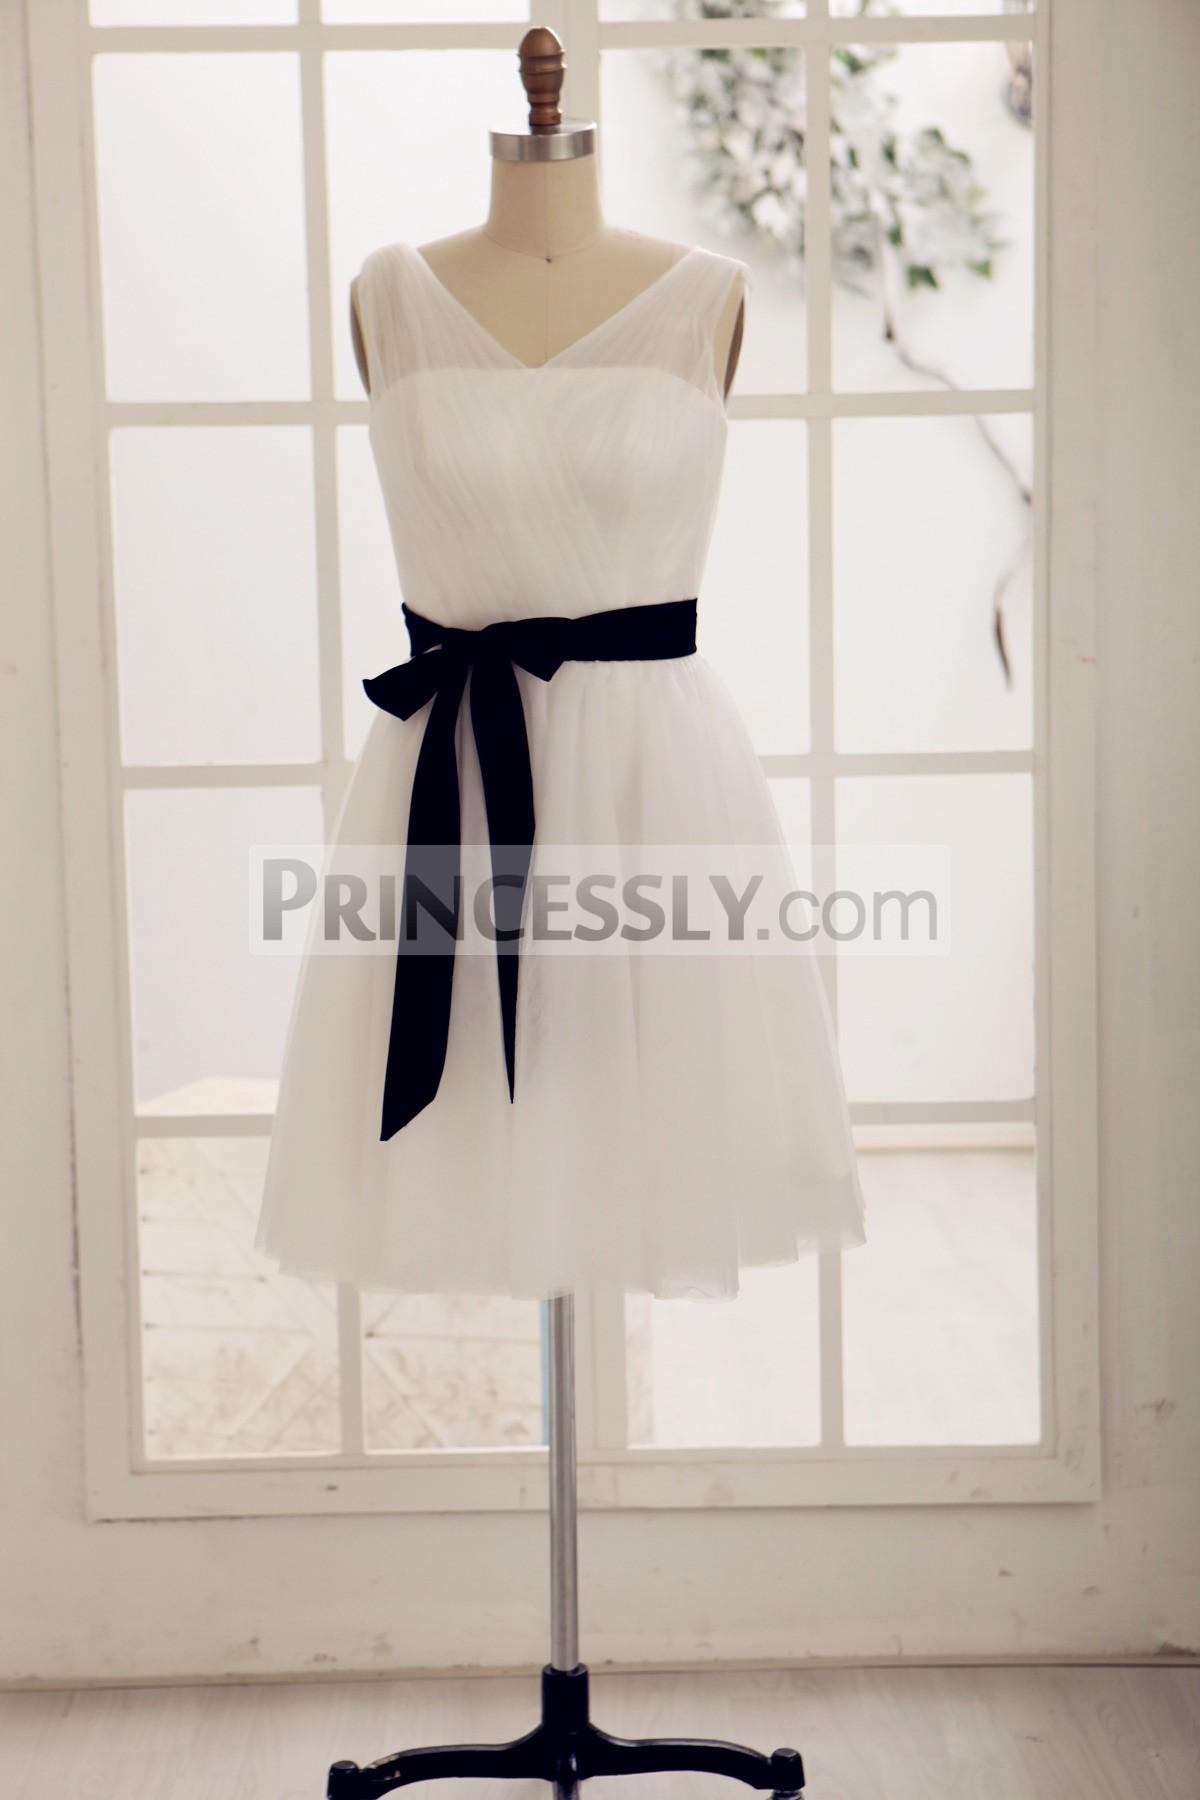 Princessly.com-K1000064-Simple V Neck Tulle Short Knee Length Bridesmaid Dress-31